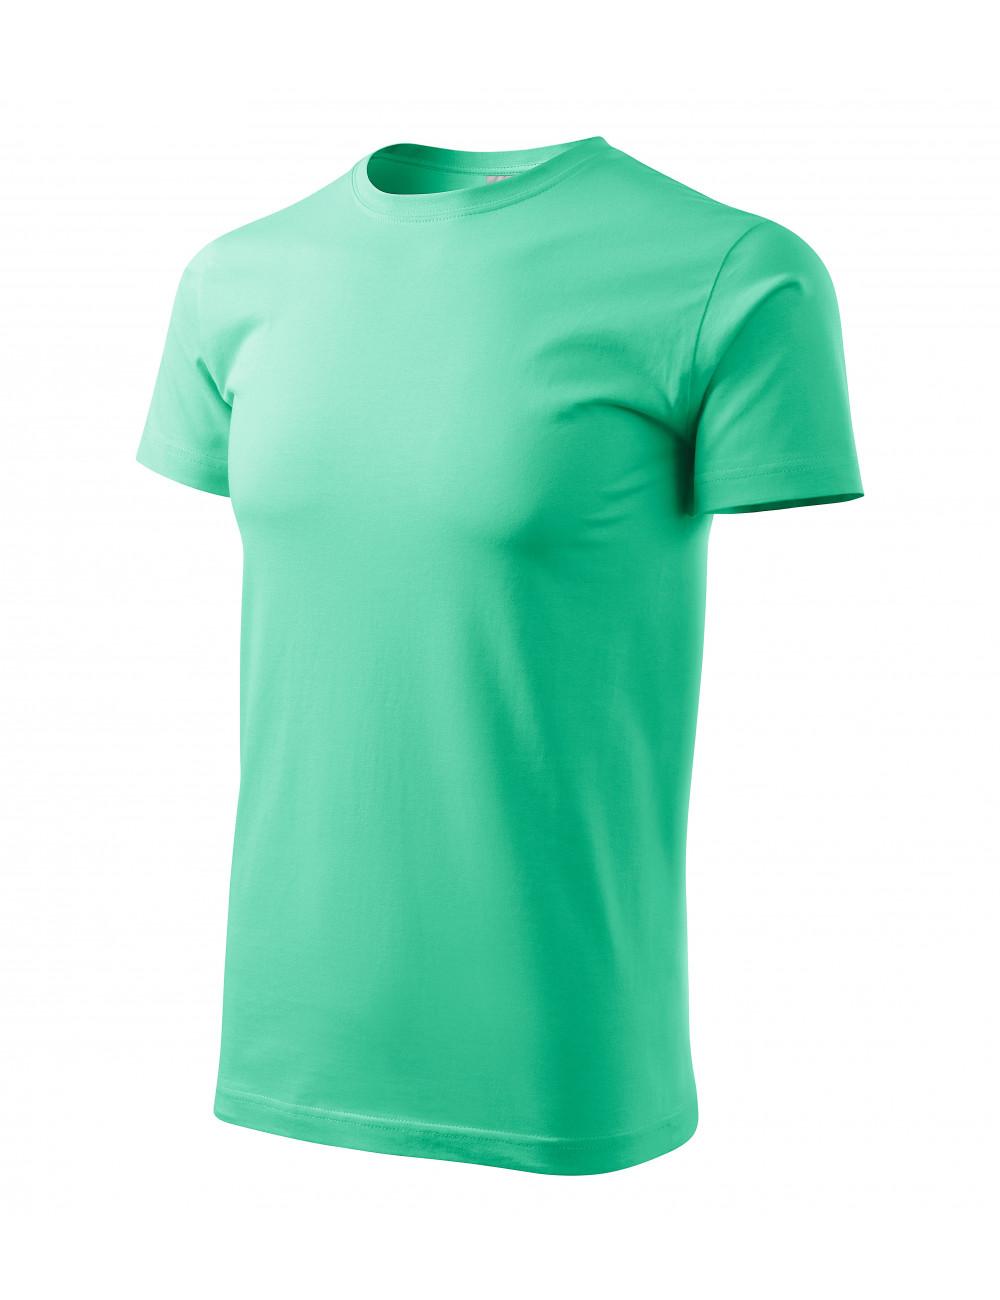 Adler MALFINI Koszulka męska Basic 129 miętowy